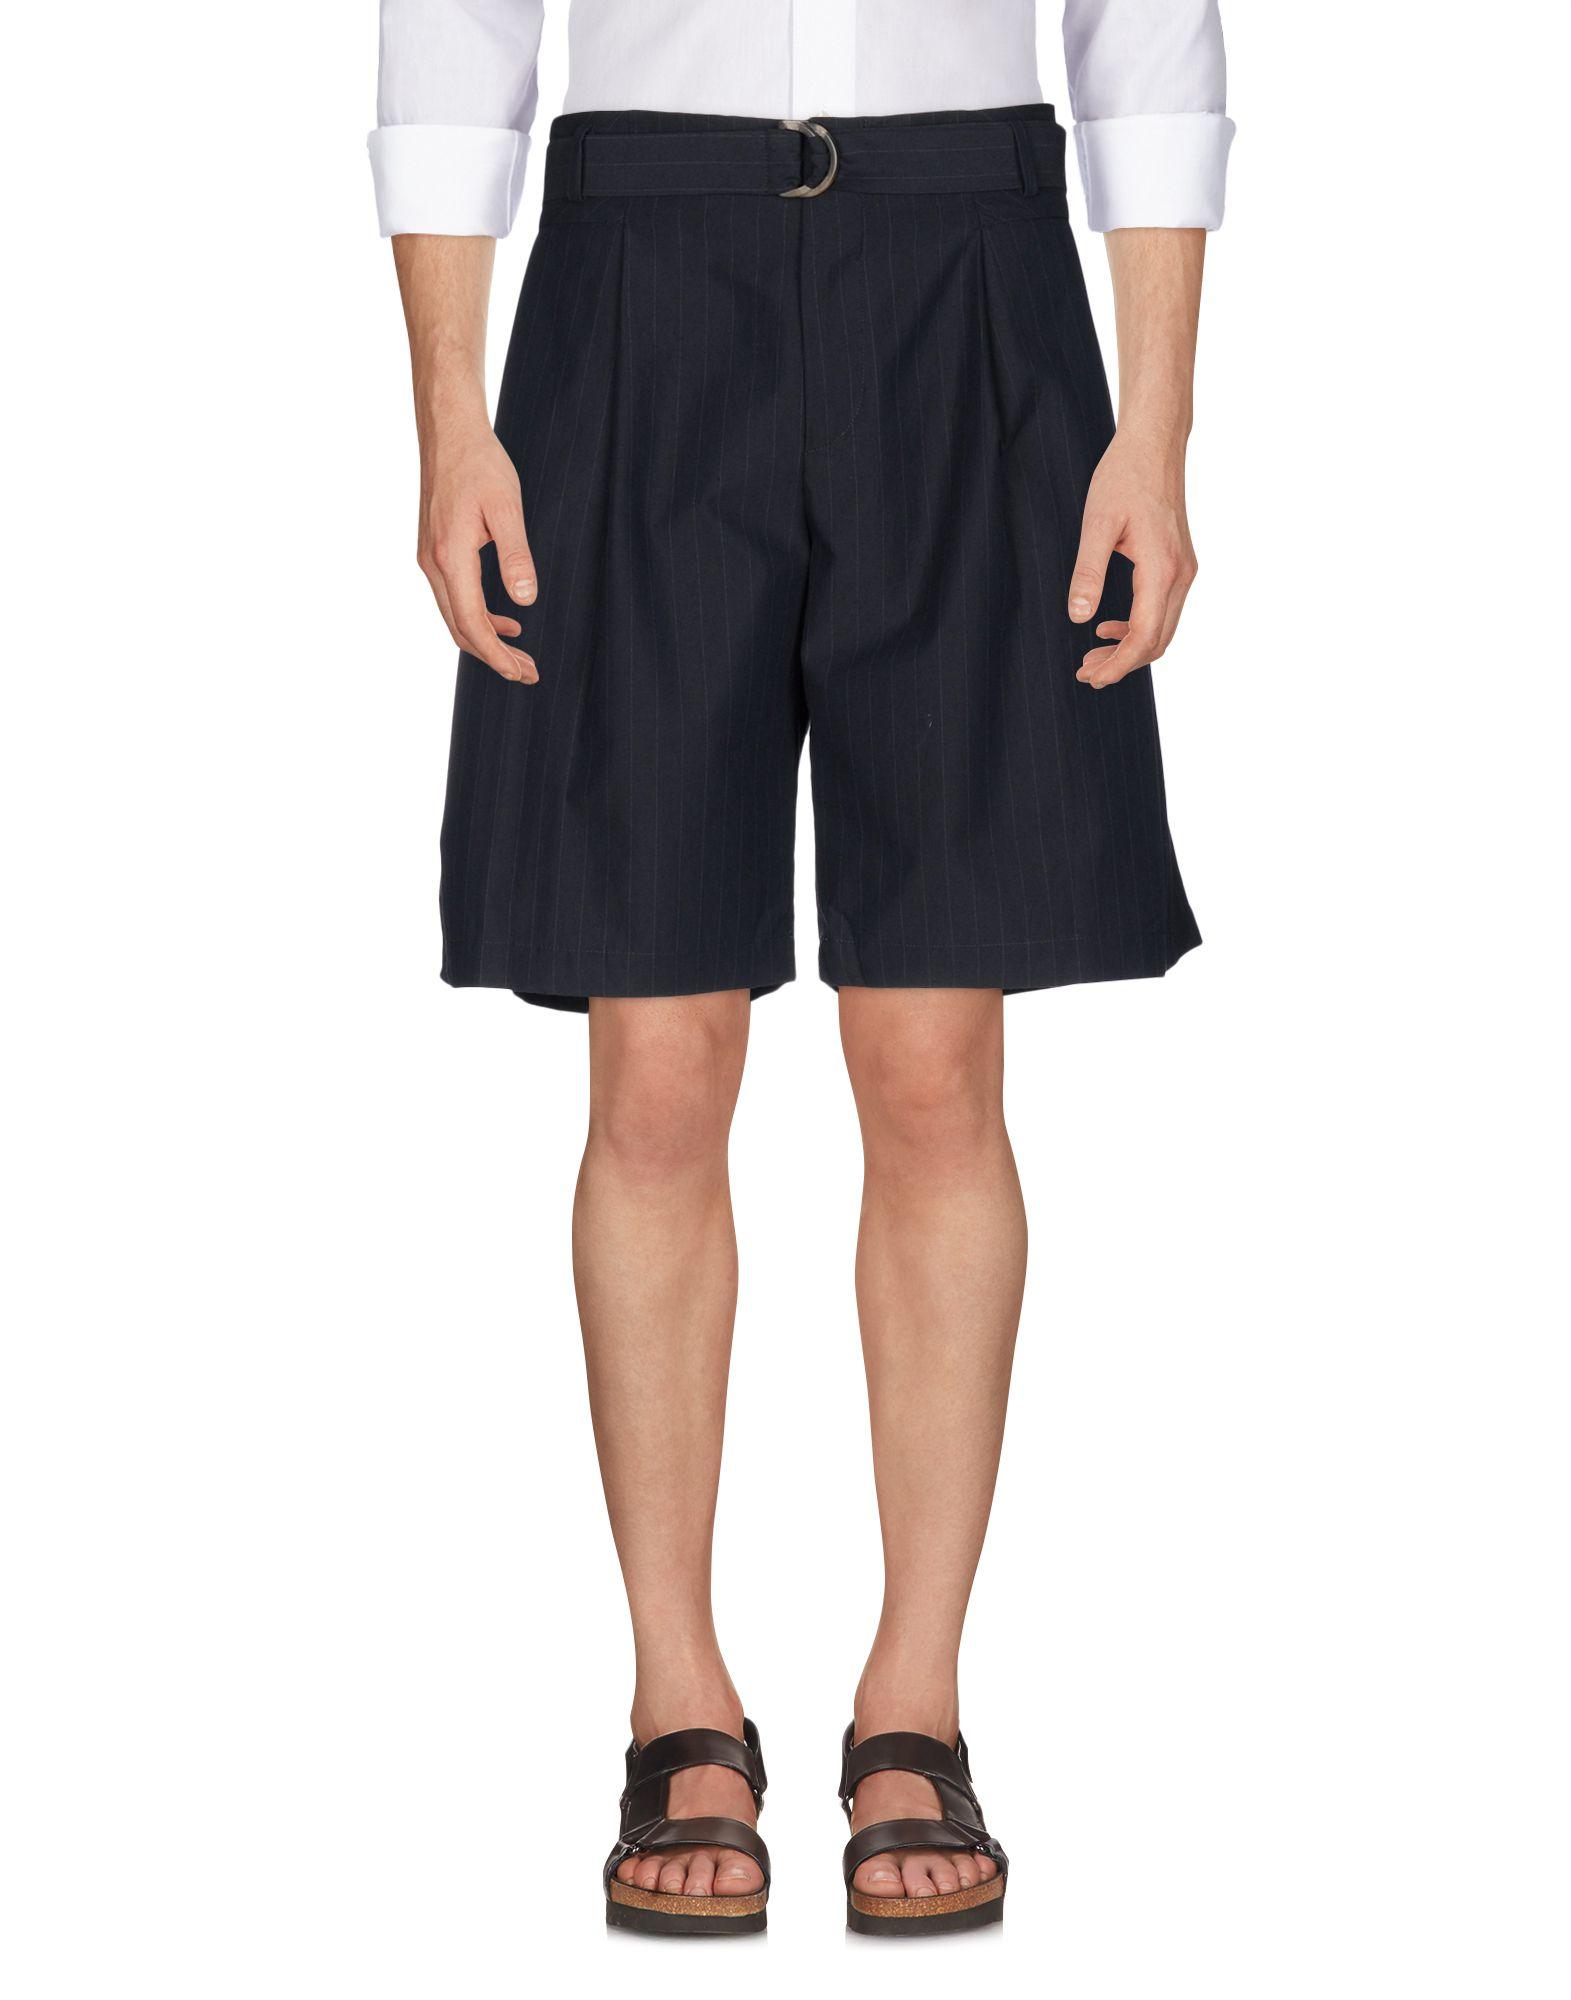 Pantalone Classico Maison Flâneur Uomo - Acquista online su